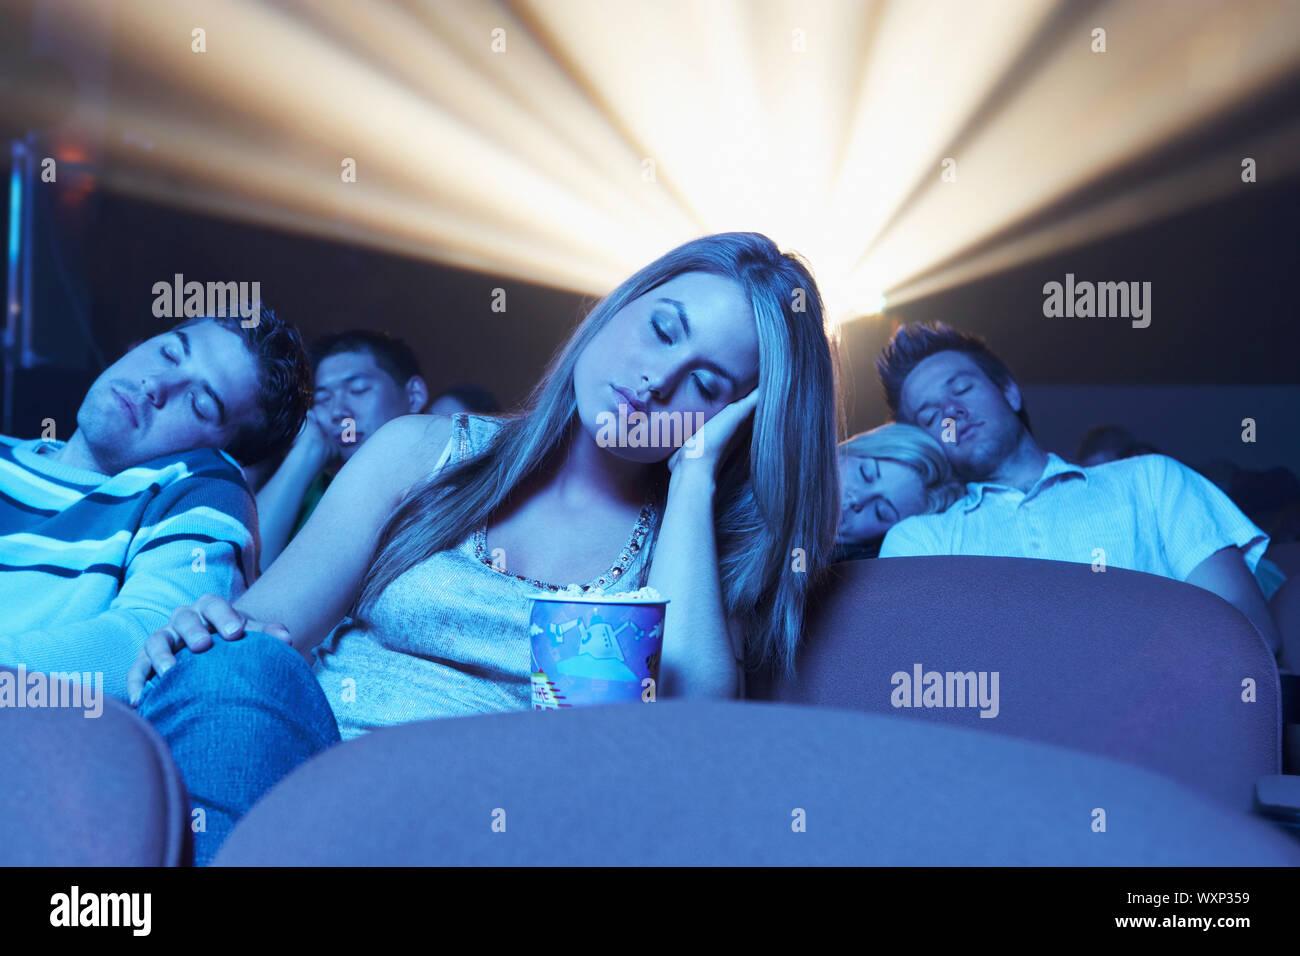 People Asleep in Movie Theater Stock Photo